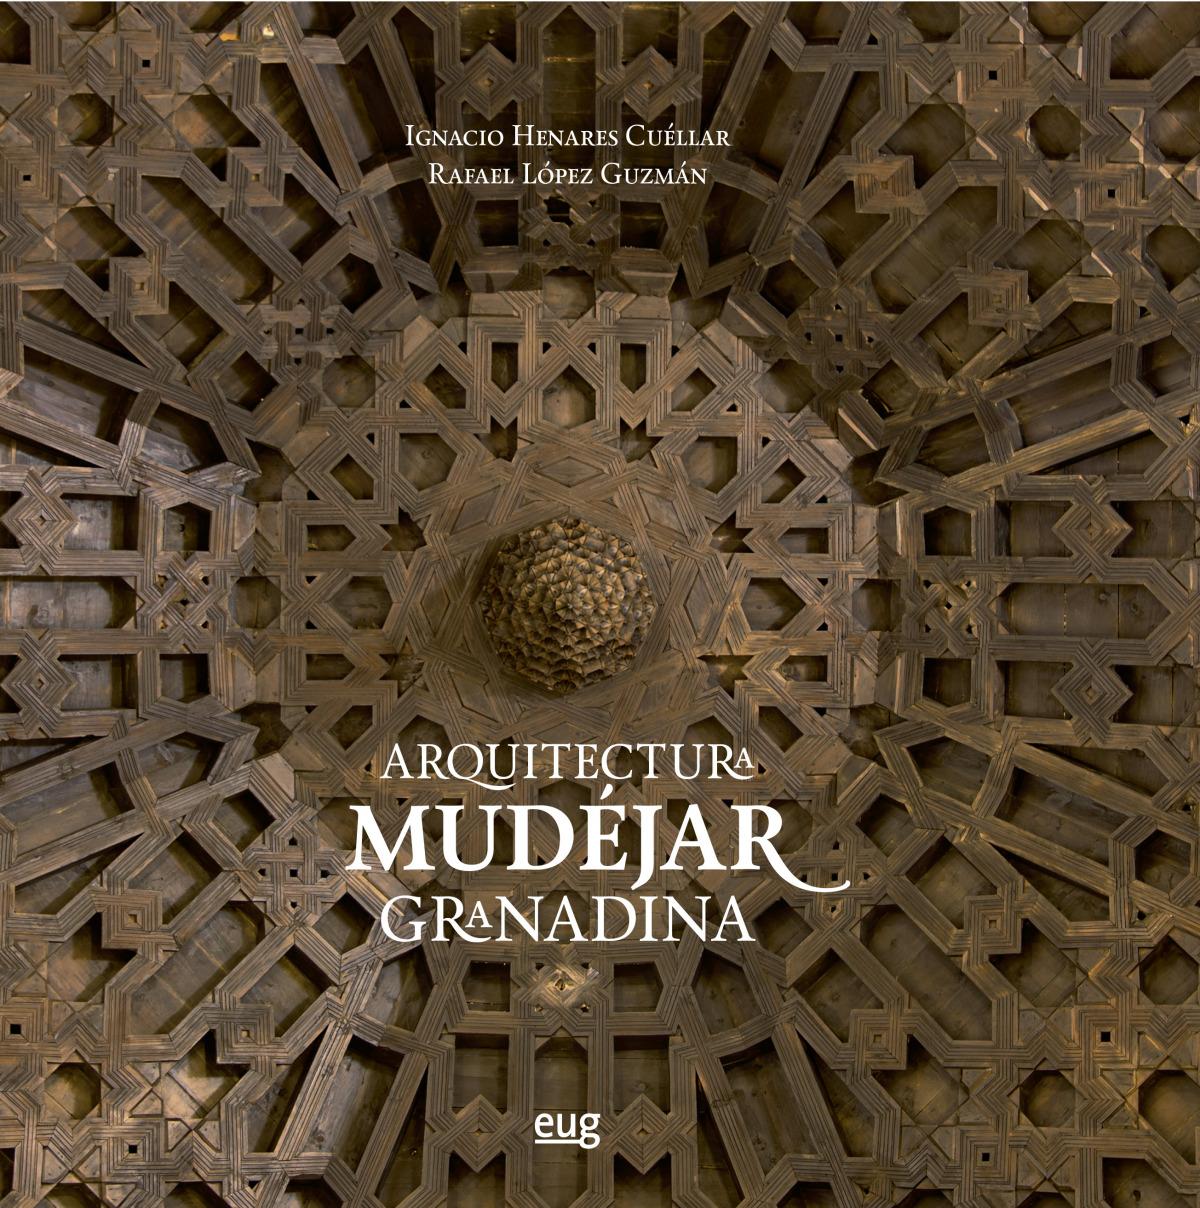 Arquitectura mudéjar granadina